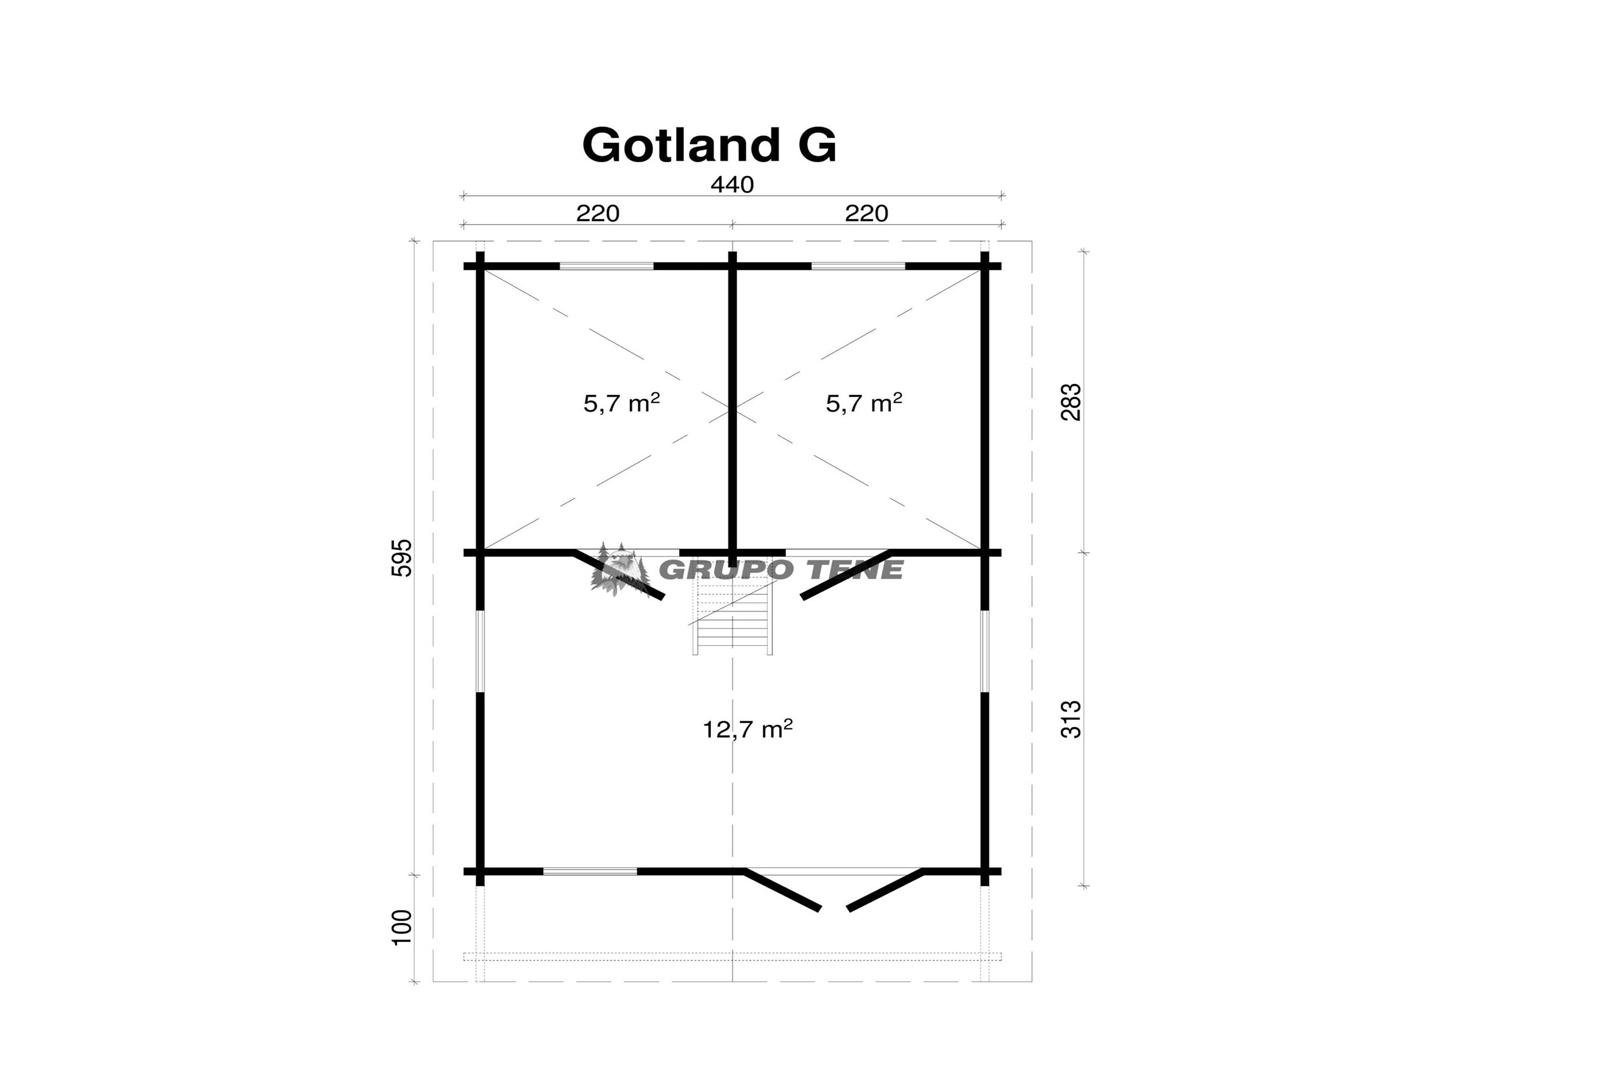 plano gotland g